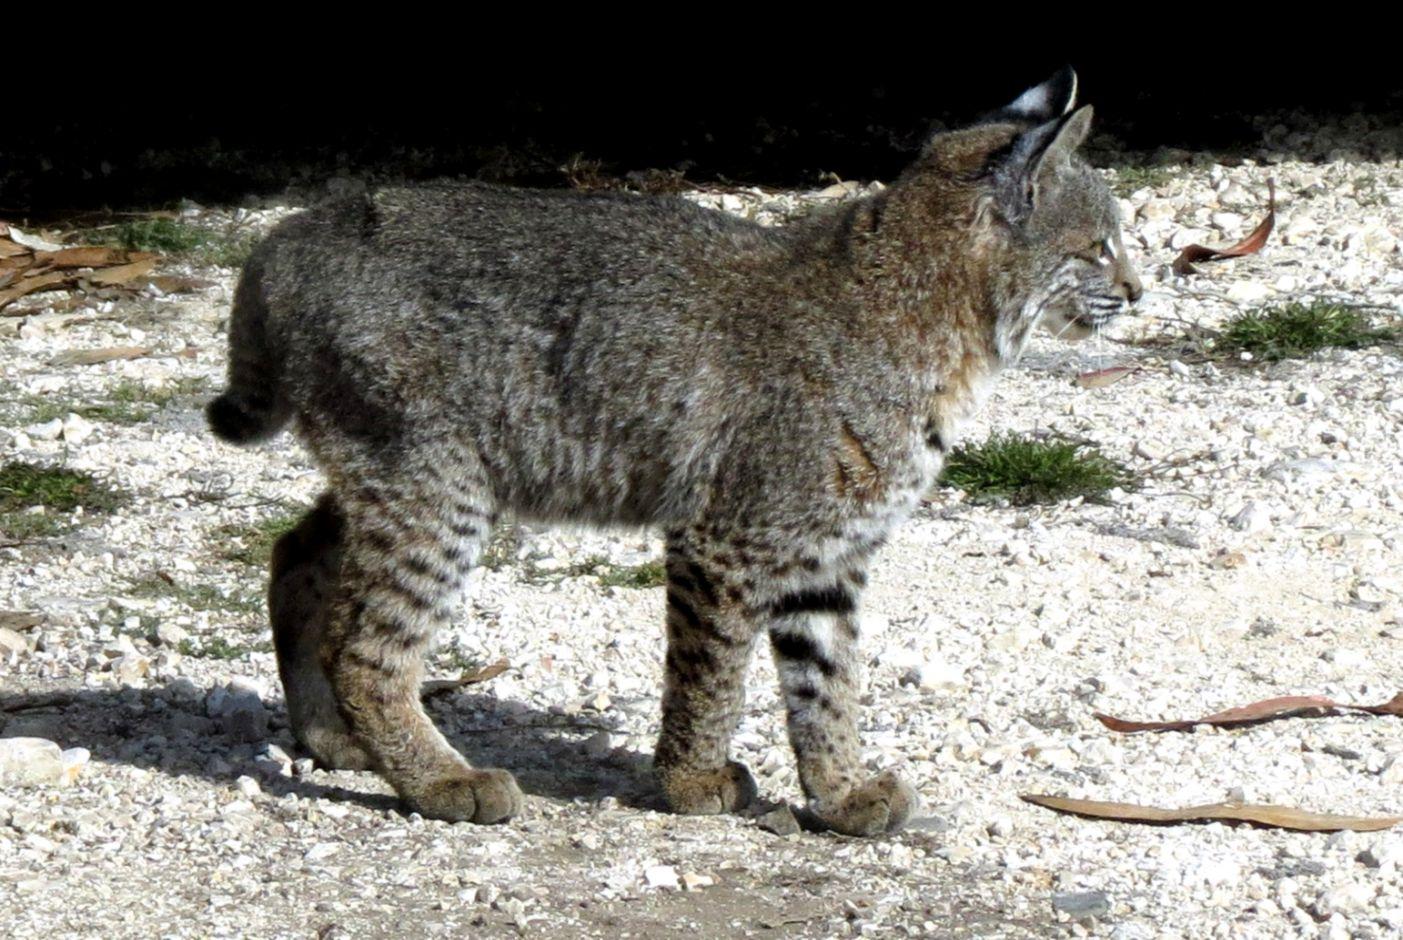 Mark Simkins got photos of Bobcat kittens – Mendonoma Sightings